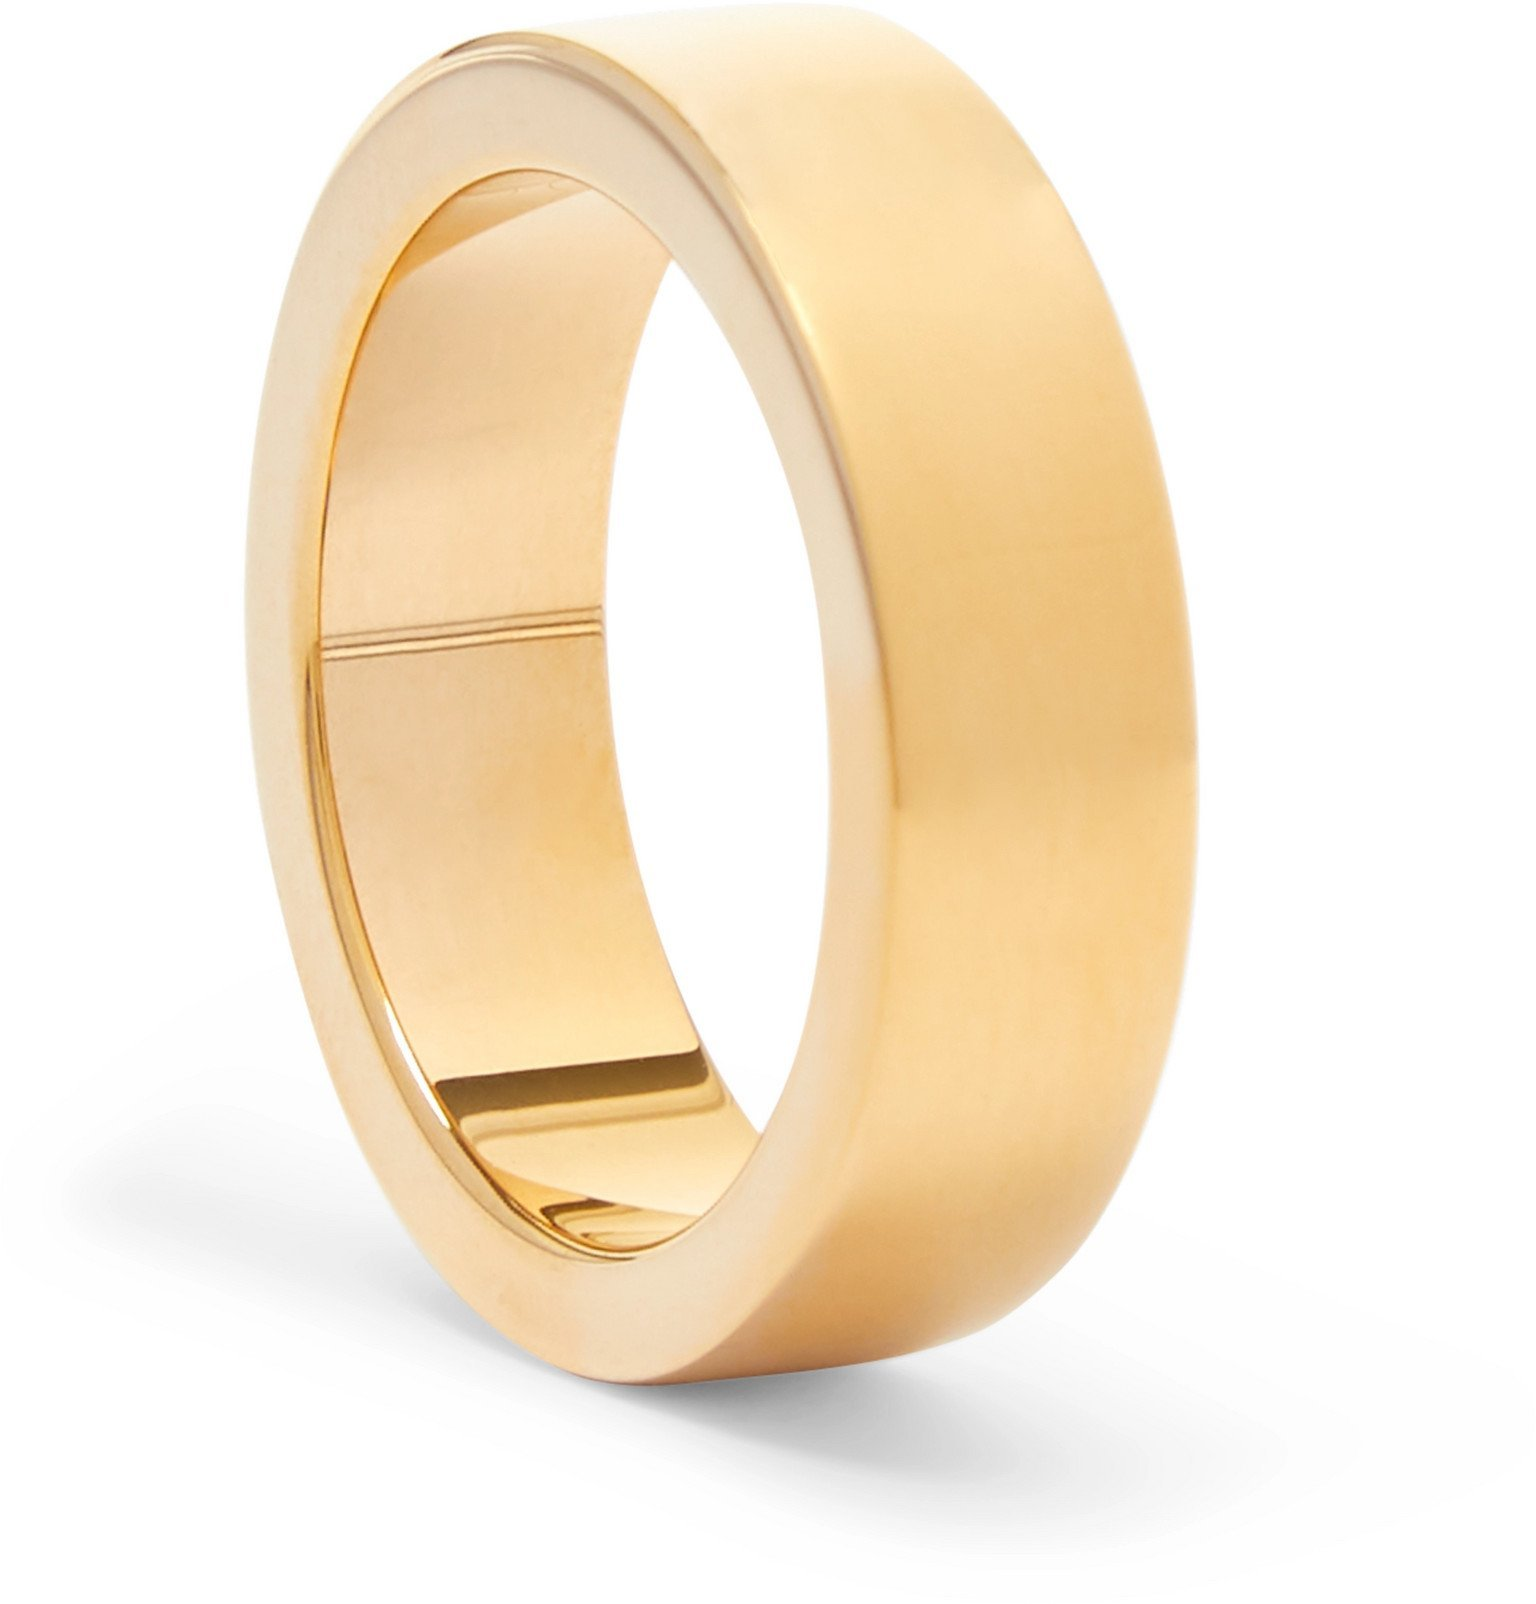 Bottega Veneta - Gold-Tone Silver Ring - Gold